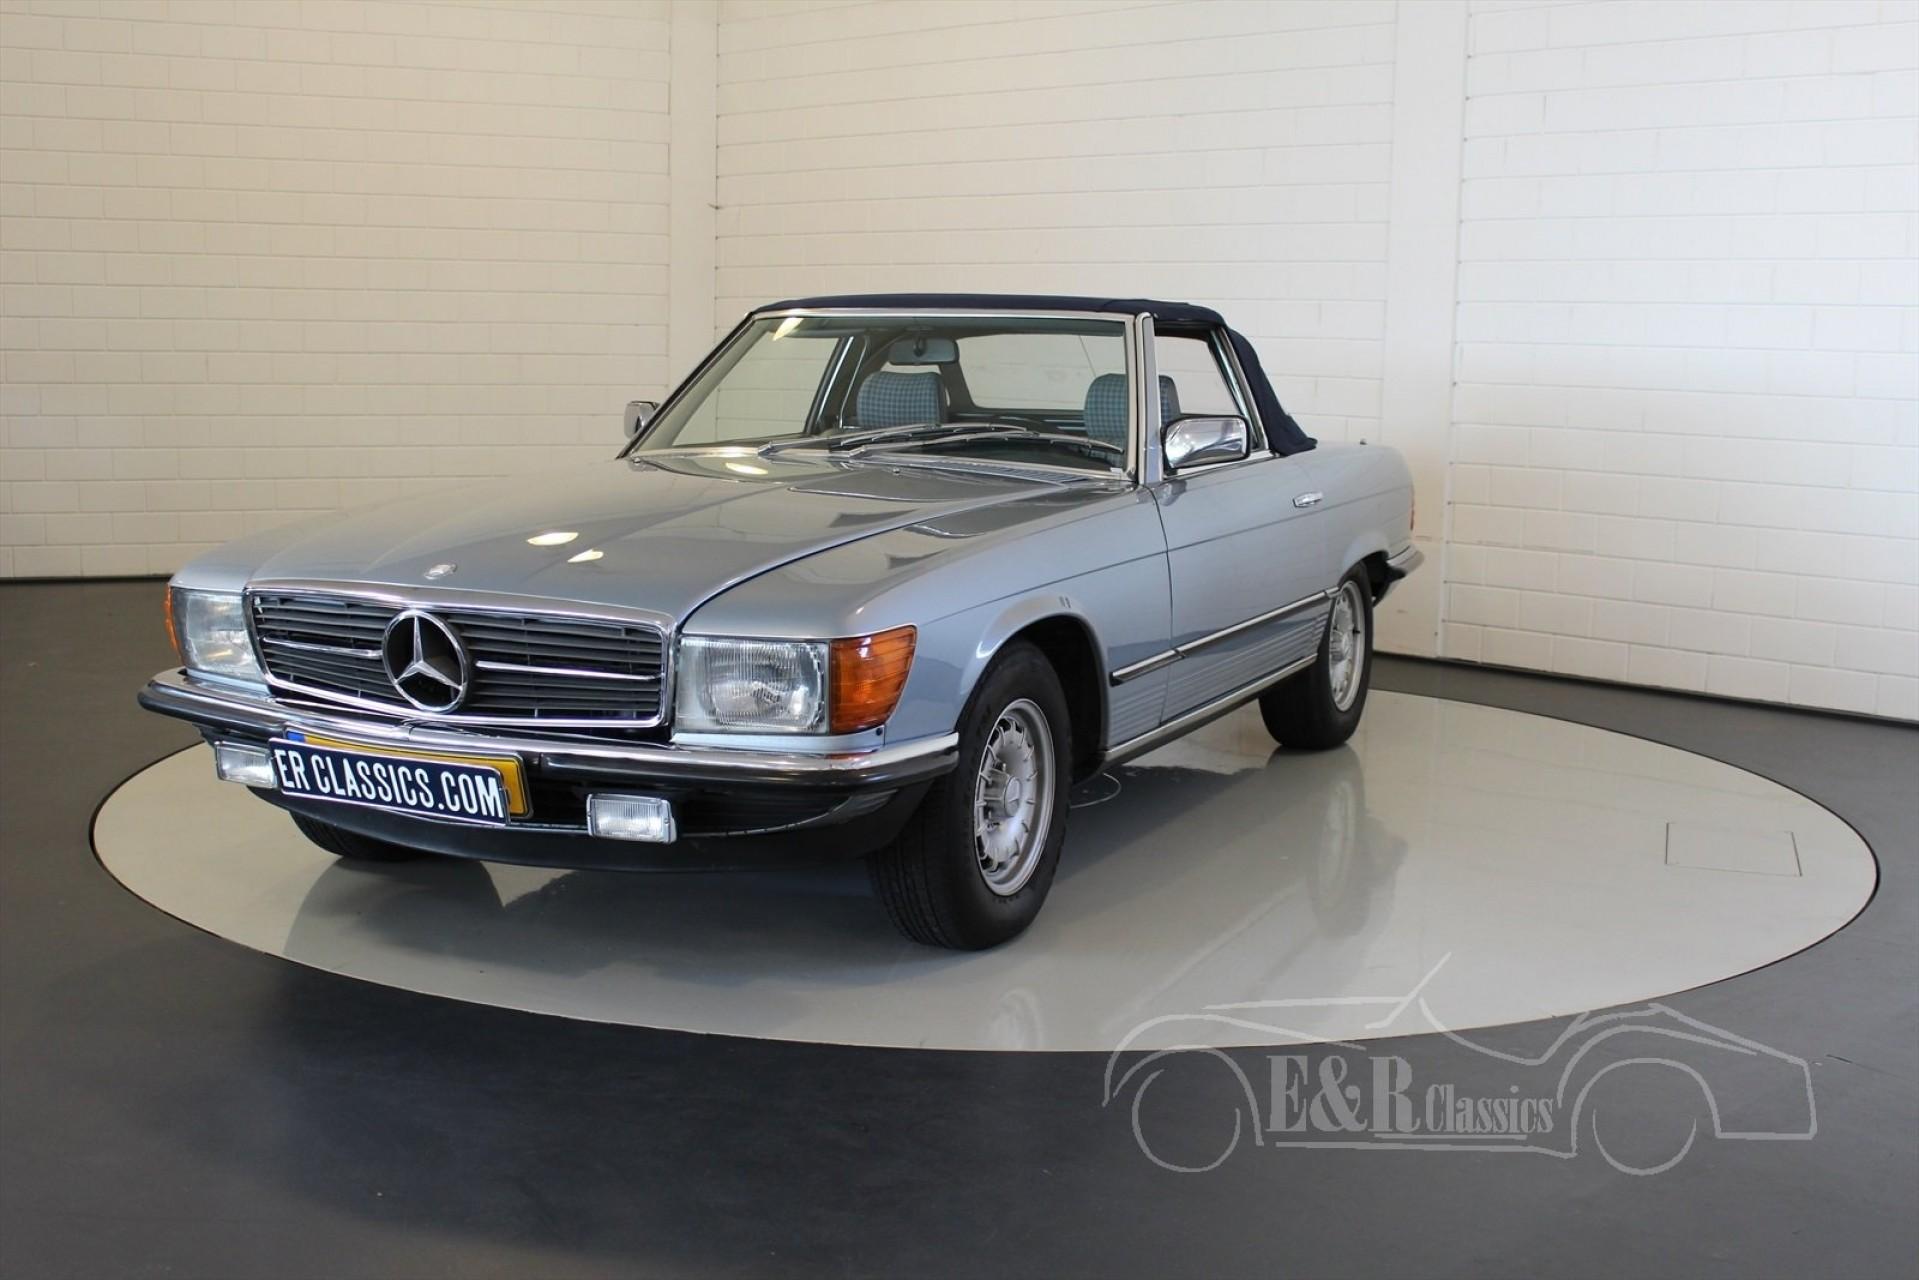 Mercedes benz 280 sl cabriolet 1983 for sale at erclassics for Mercedes benz 1983